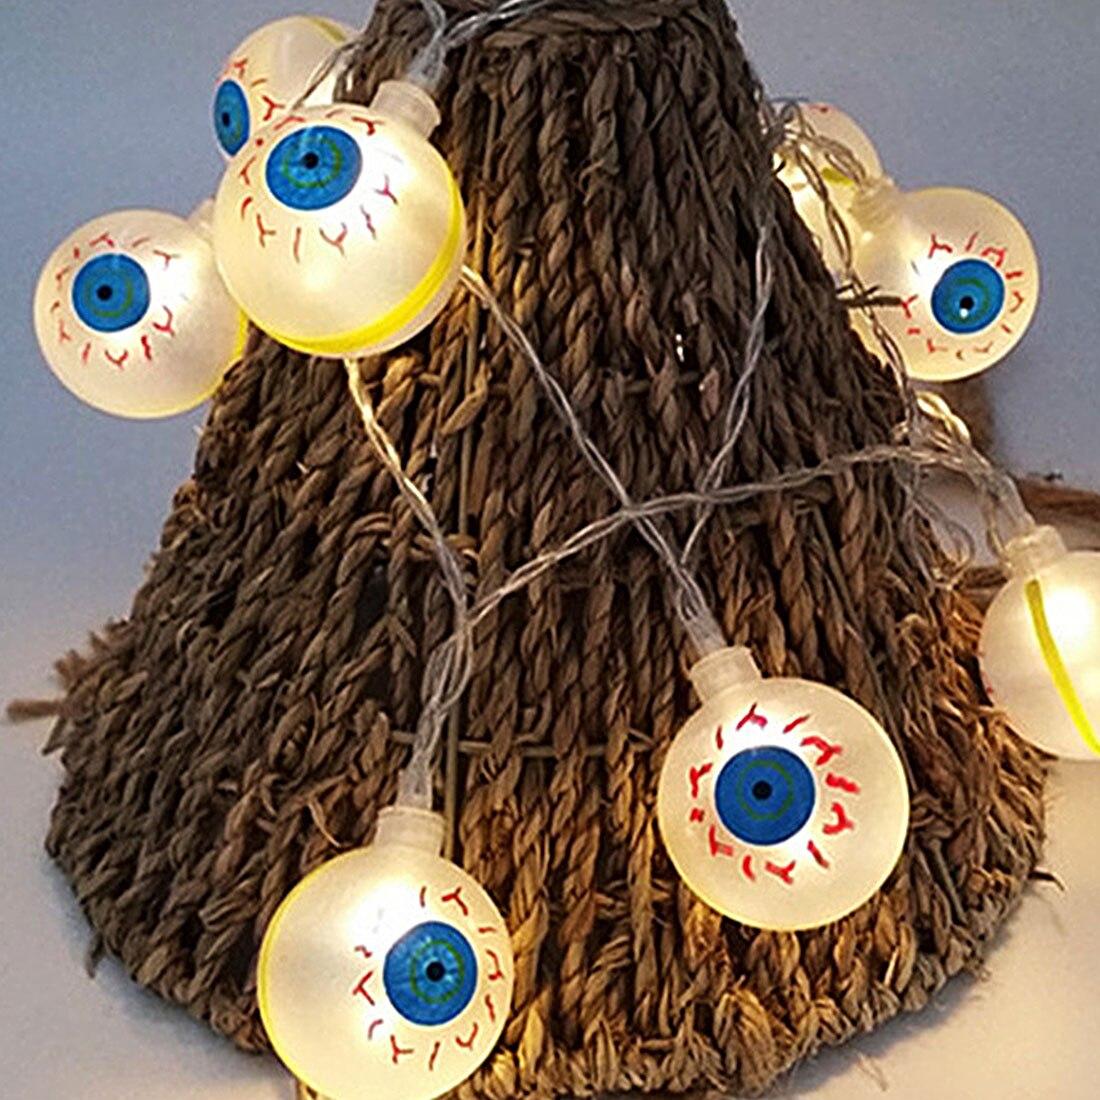 Hot!Best 10LED 1.2M Eyeballs Halloween Decor LED String Lights Lanterns Lamp for DIY Home Bar Outdoor Party Supplies